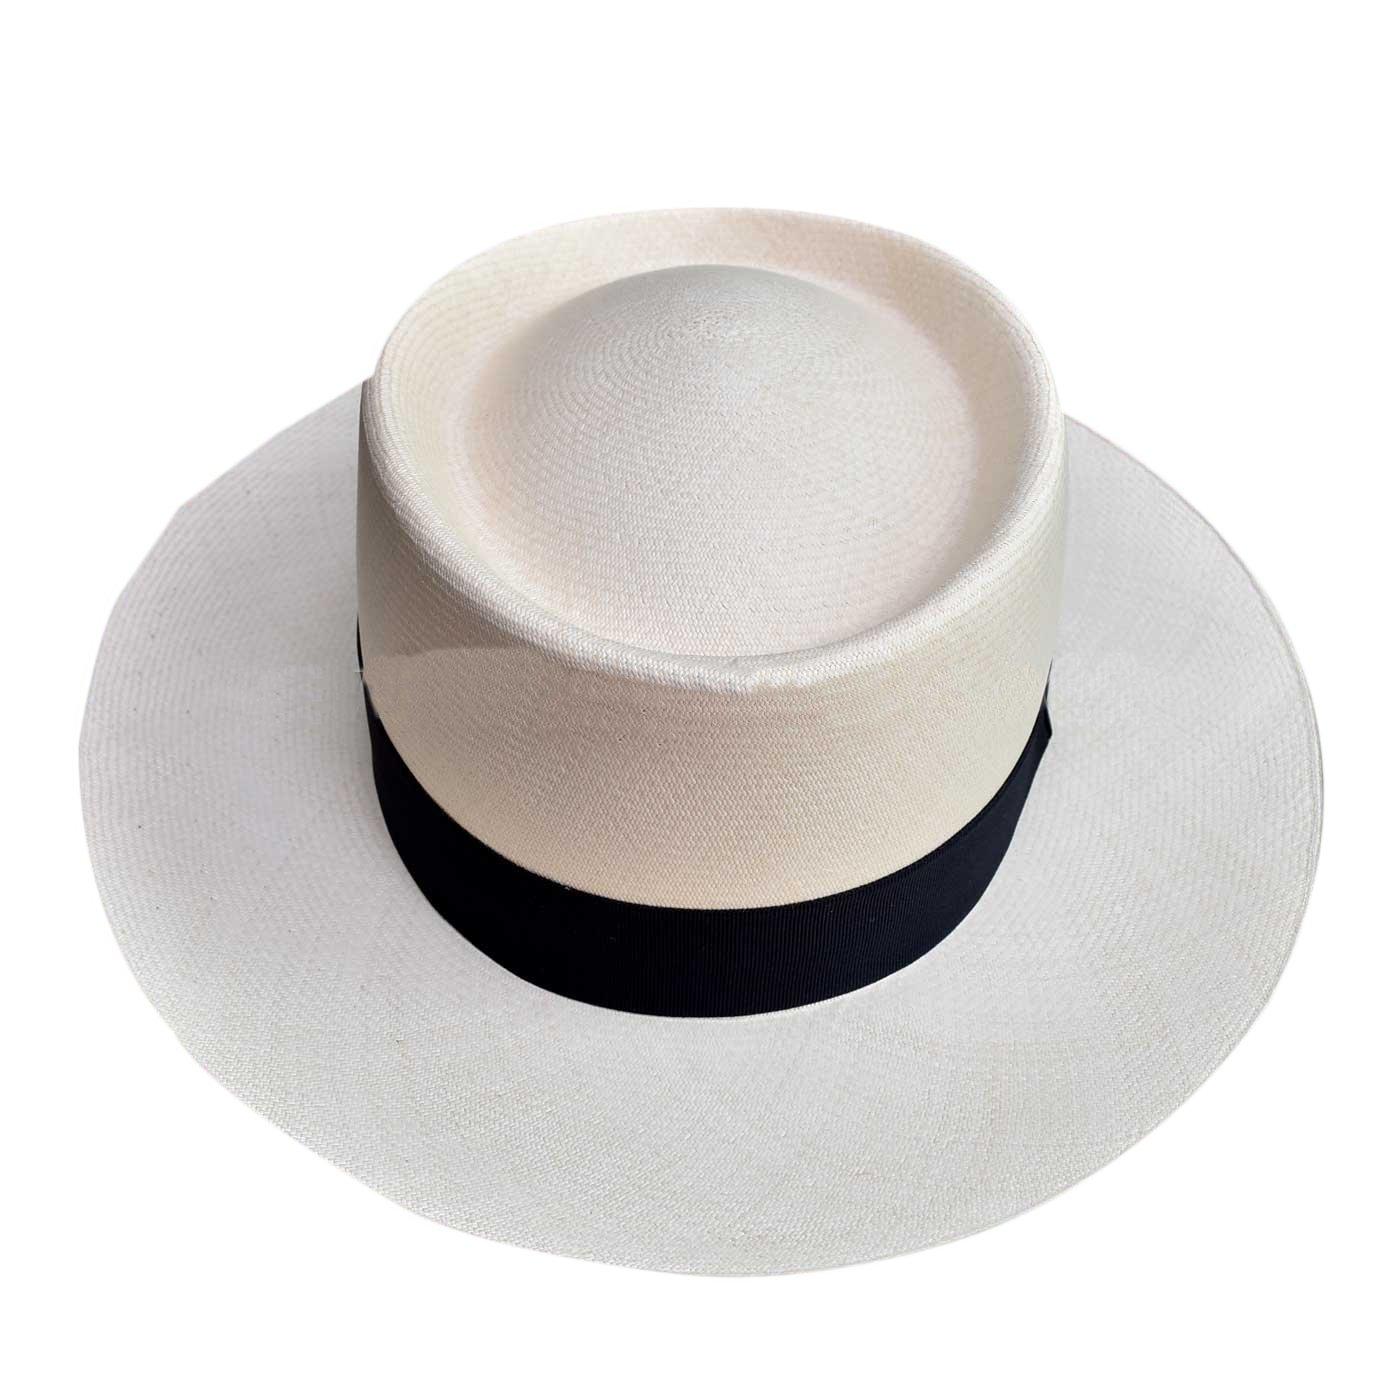 Kepelle Montecristi Panama hat GAMBLER grade 14/15 , color white , lace  black